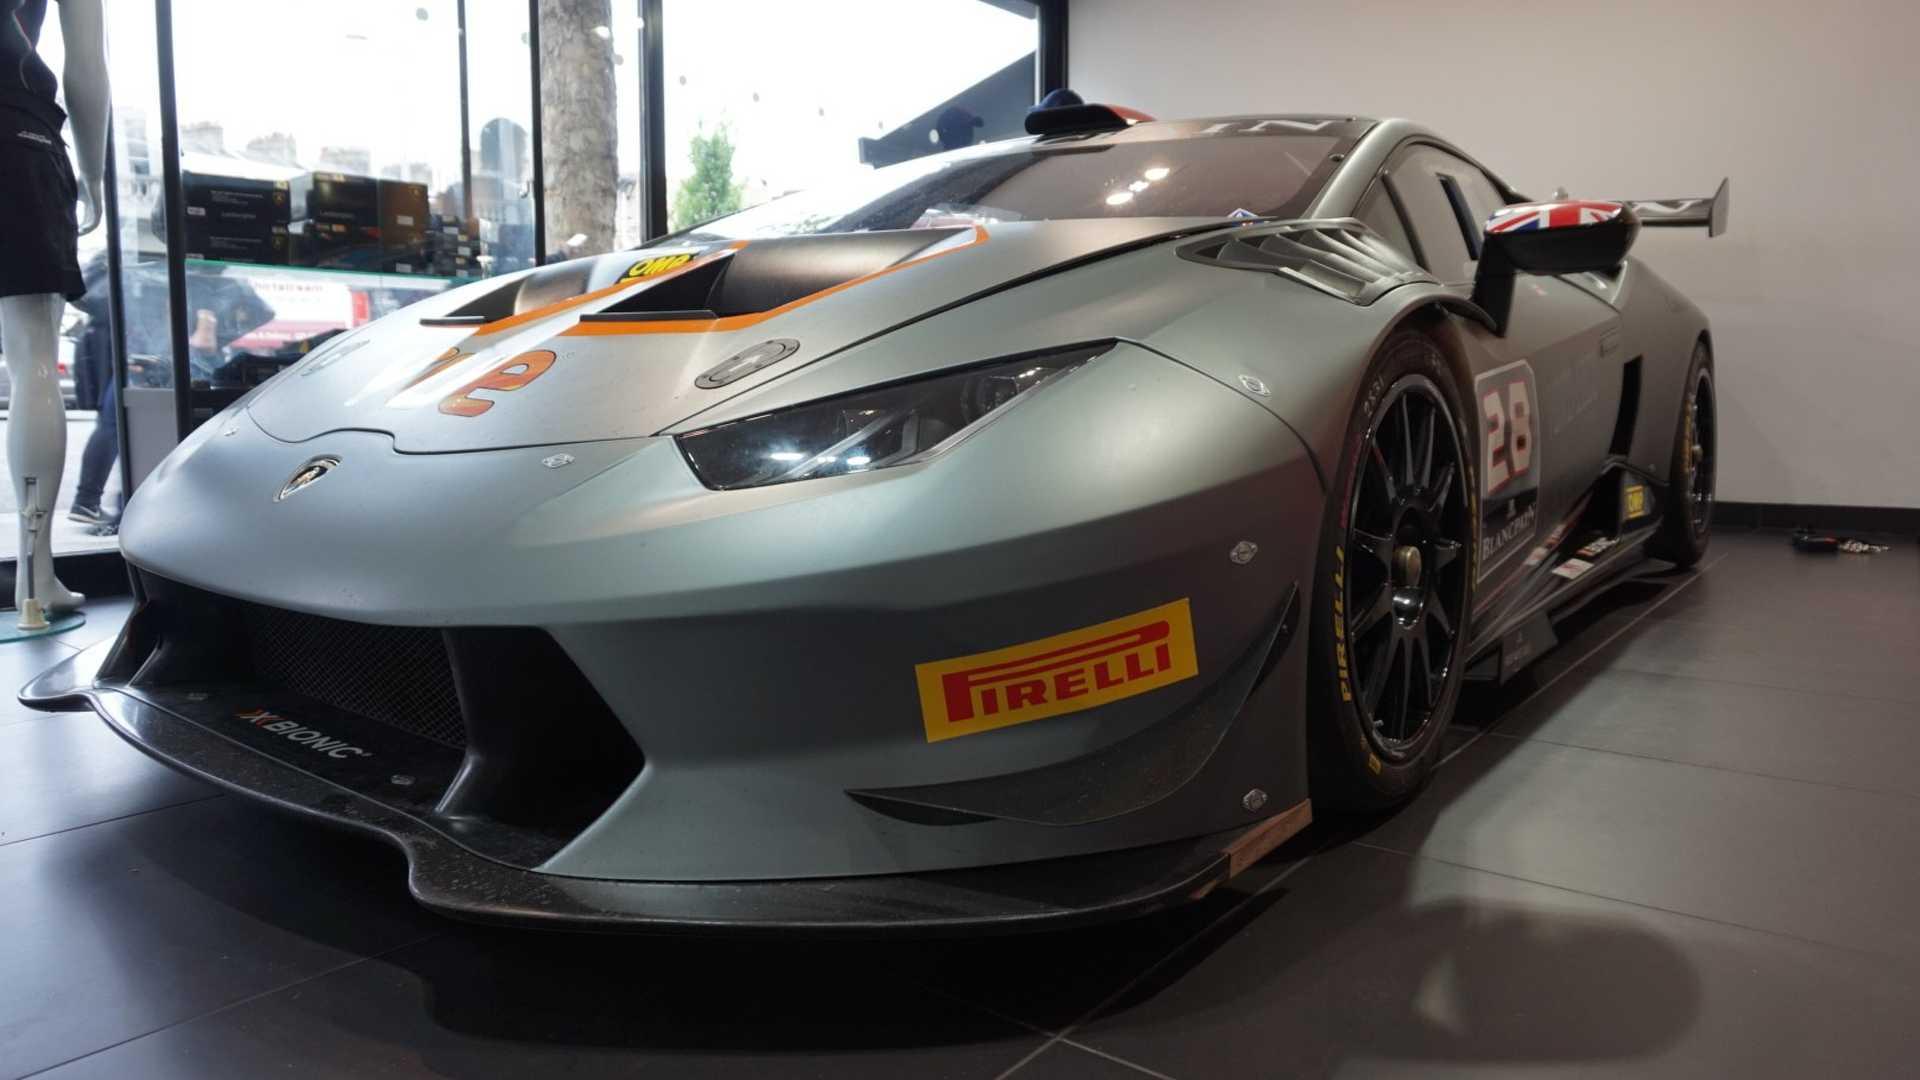 2016 Lamborghini Huracan Super Trofeo For Sale $175,000 ...   2016 Lamborghini Huracan Super Trofeo